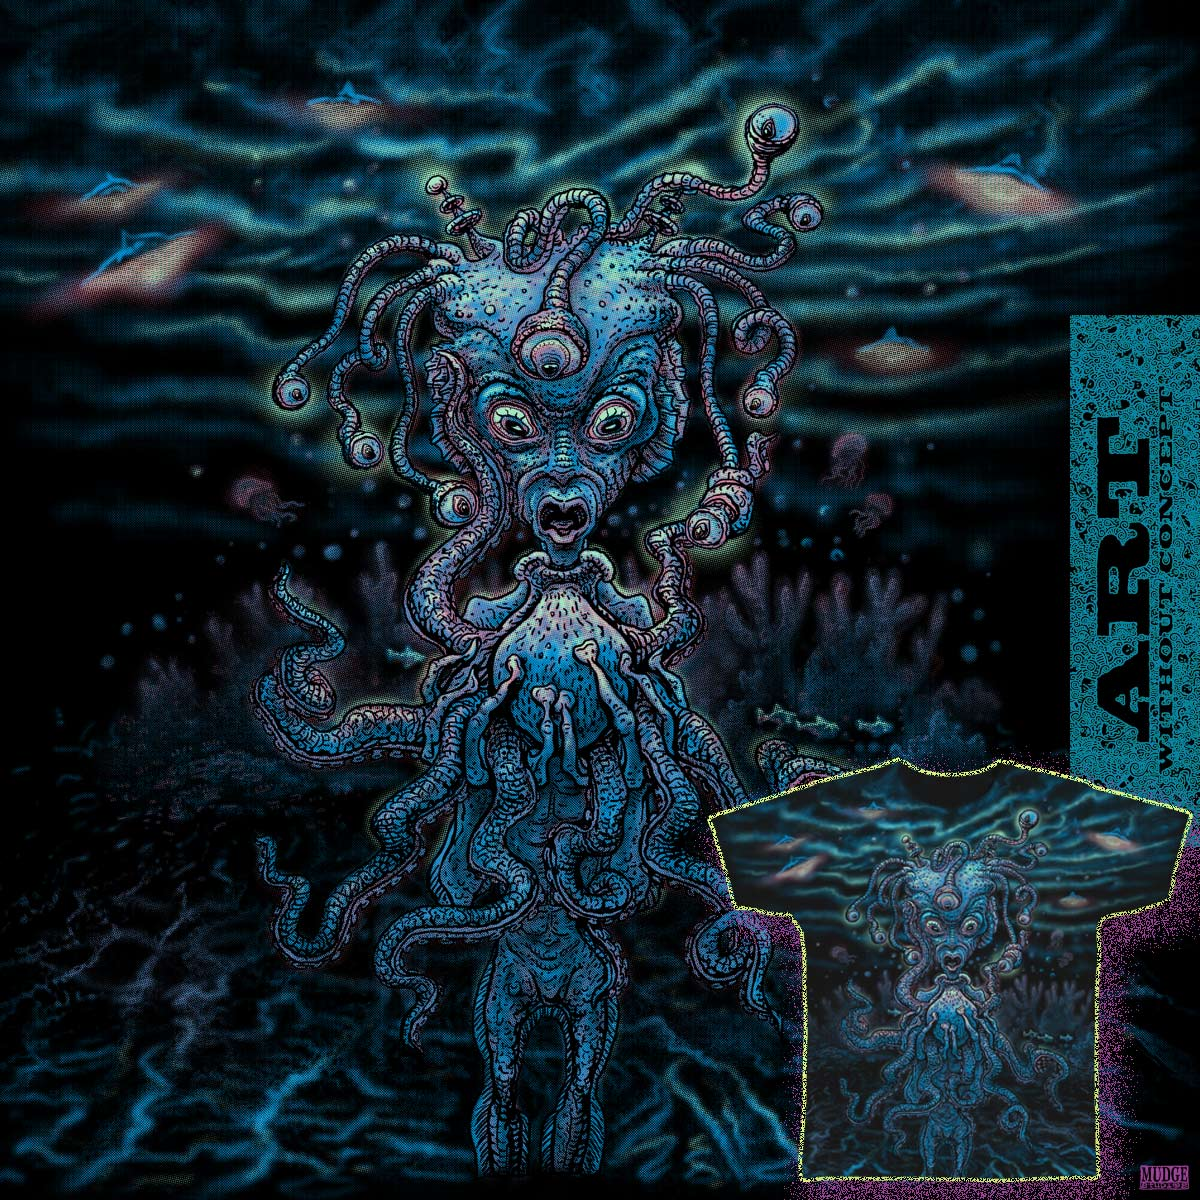 Octo Alien by MudgeStudios on Threadless